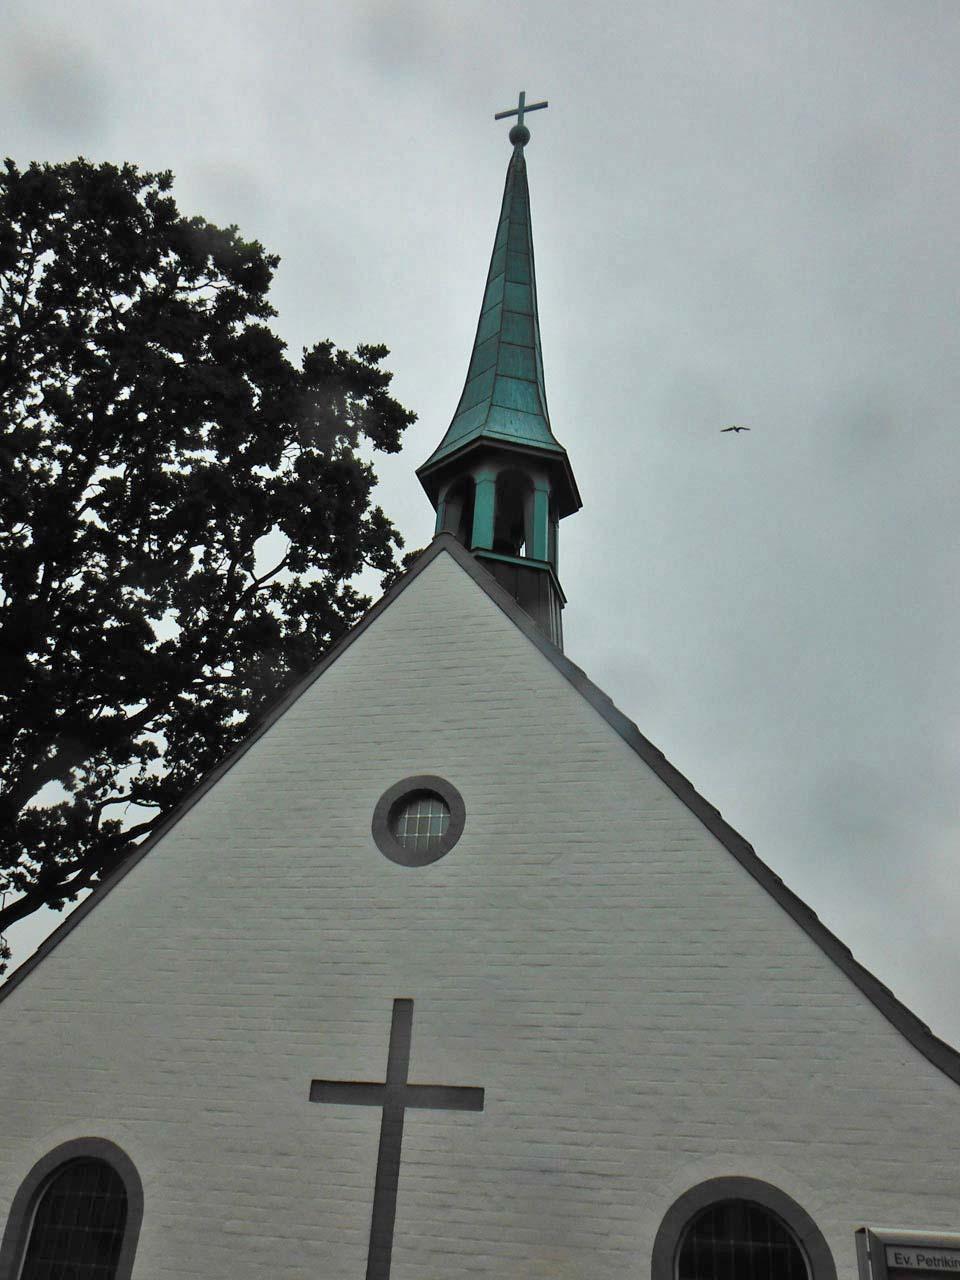 Glockenturm der St. Petrikirche in Maasholm